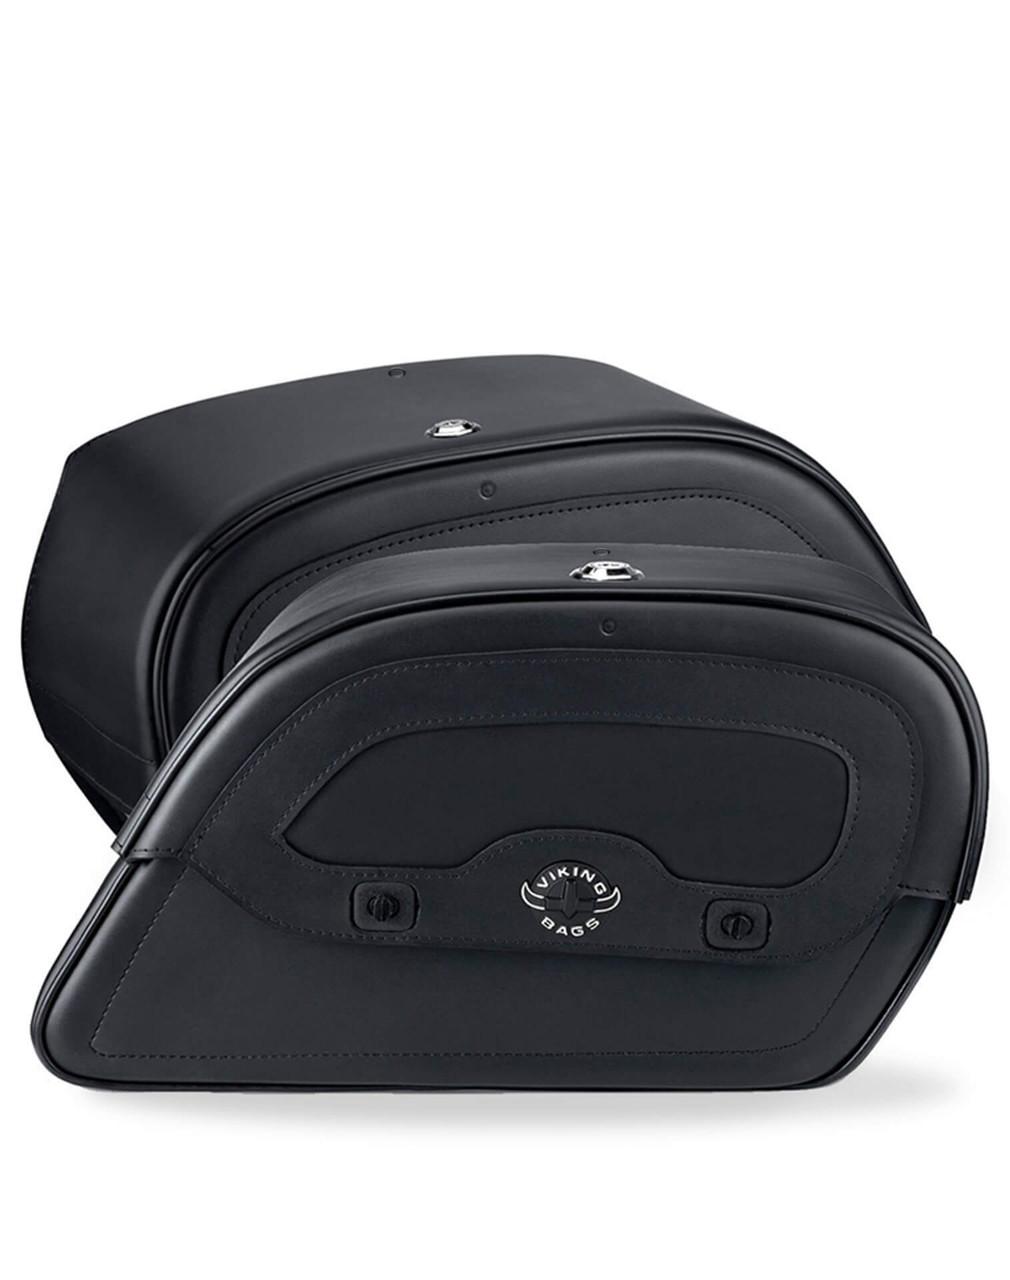 Honda 1500 Valkyrie Standard Warrior M Motorcycle saddlebags Both Bags View